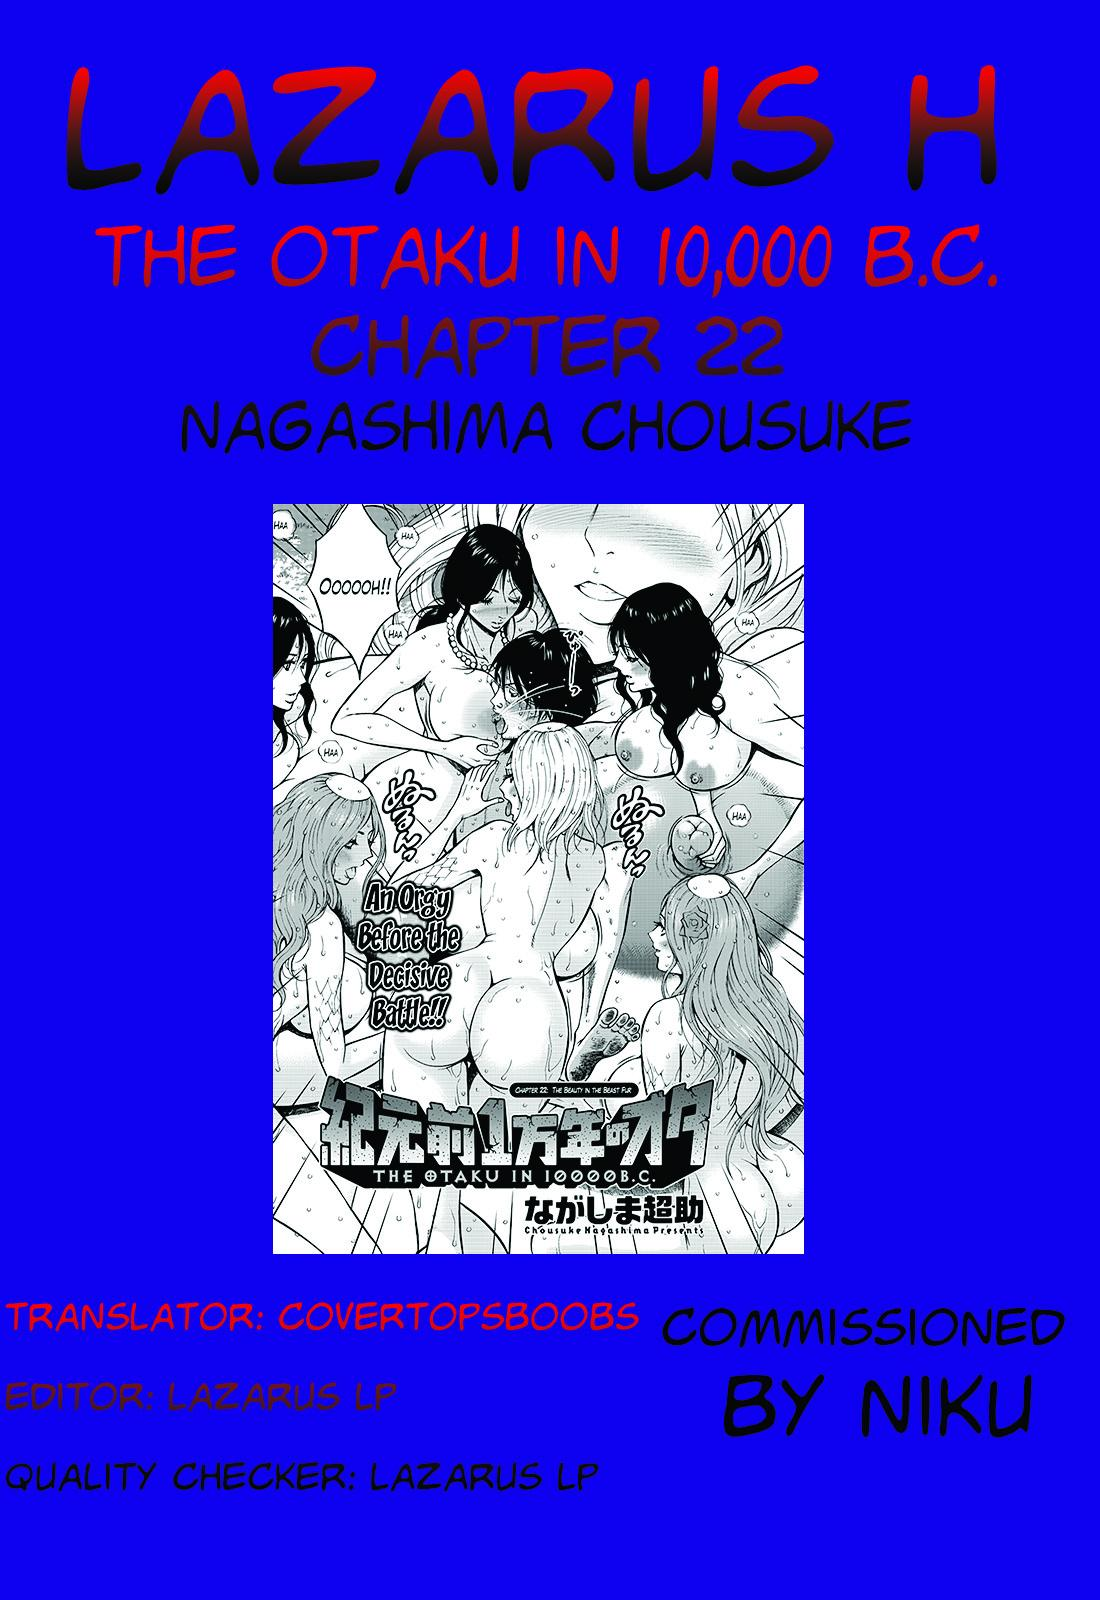 Kigenzen 10000 Nen no Ota   The Otaku in 10,000 B.C. Ch. 1-22 421